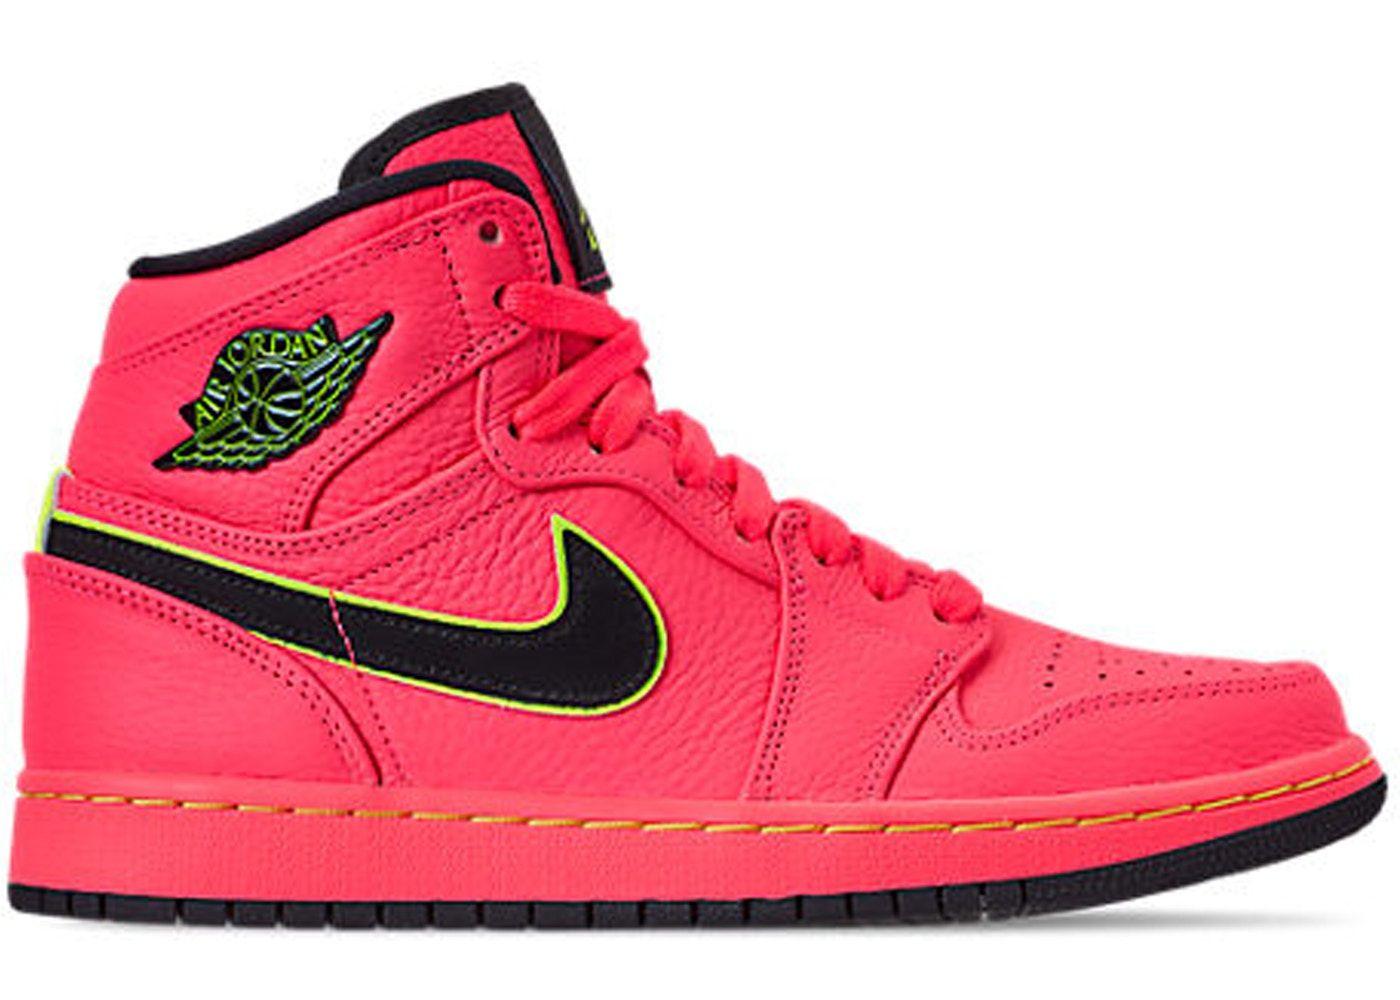 e792c270 Jordan 1 Retro High Hot Punch (W) in 2019 | Shoes | Jordans, Jordan ...